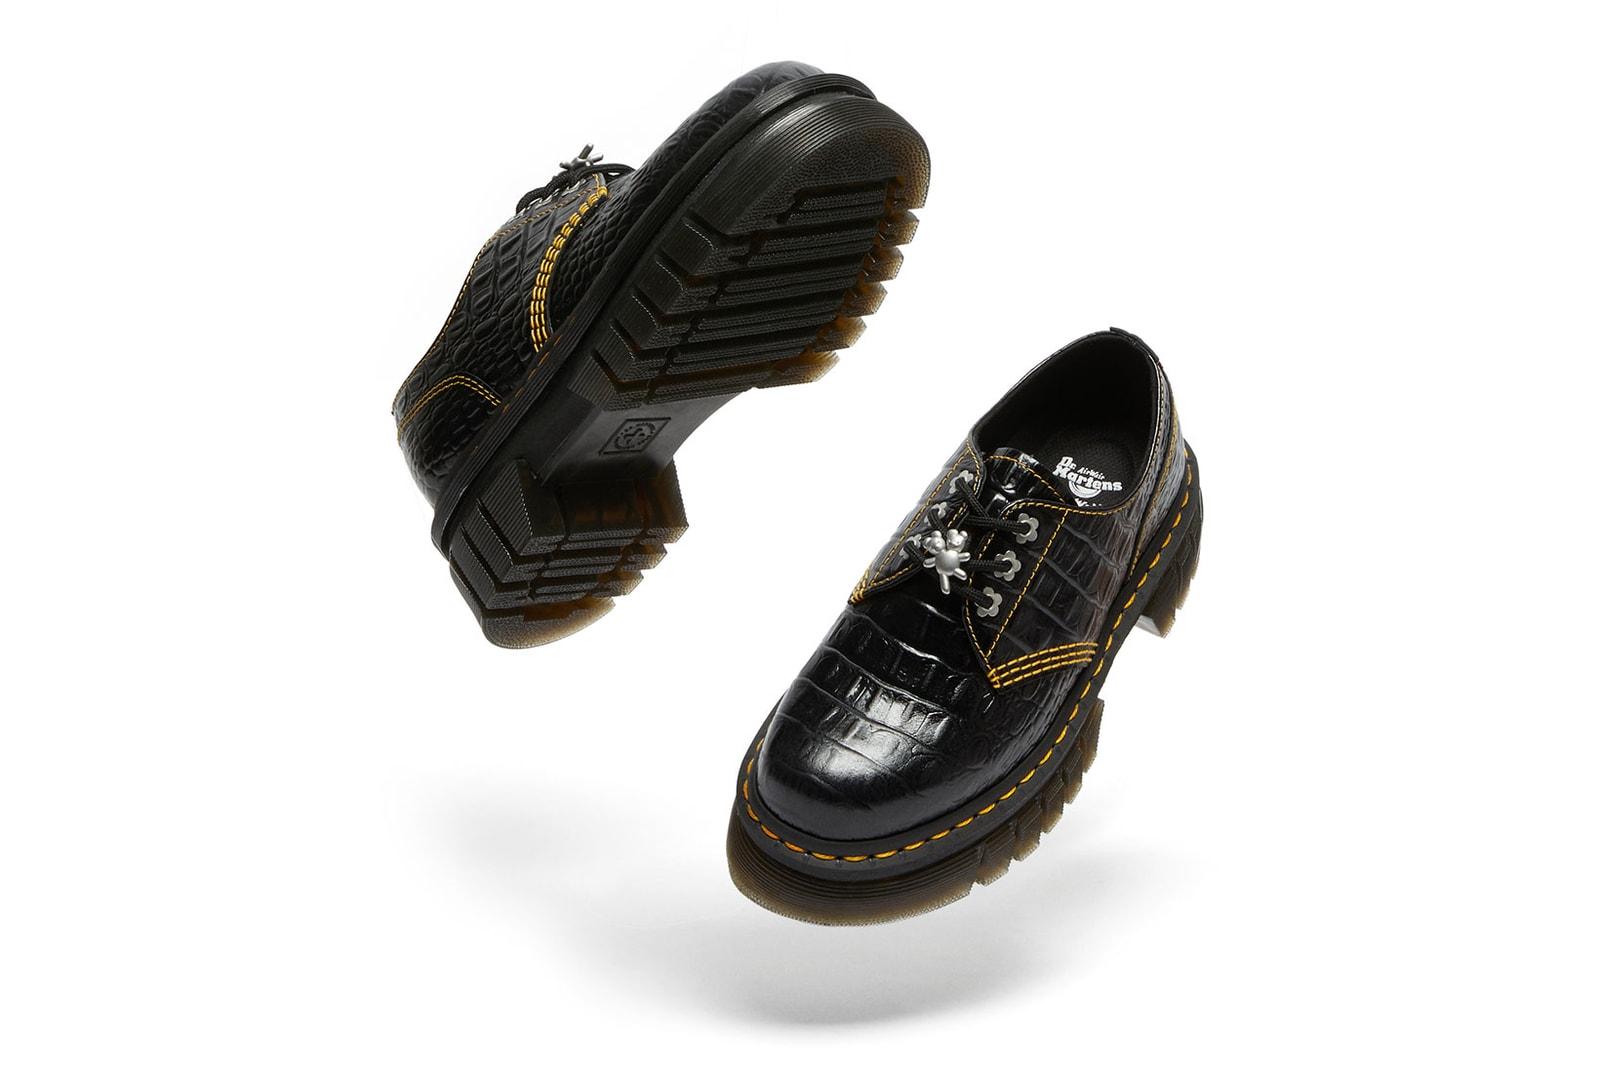 Heaven by Marc Jacobs Dr. Martens Audrick 8i HMJ Croc Boots Collaboration Release Date